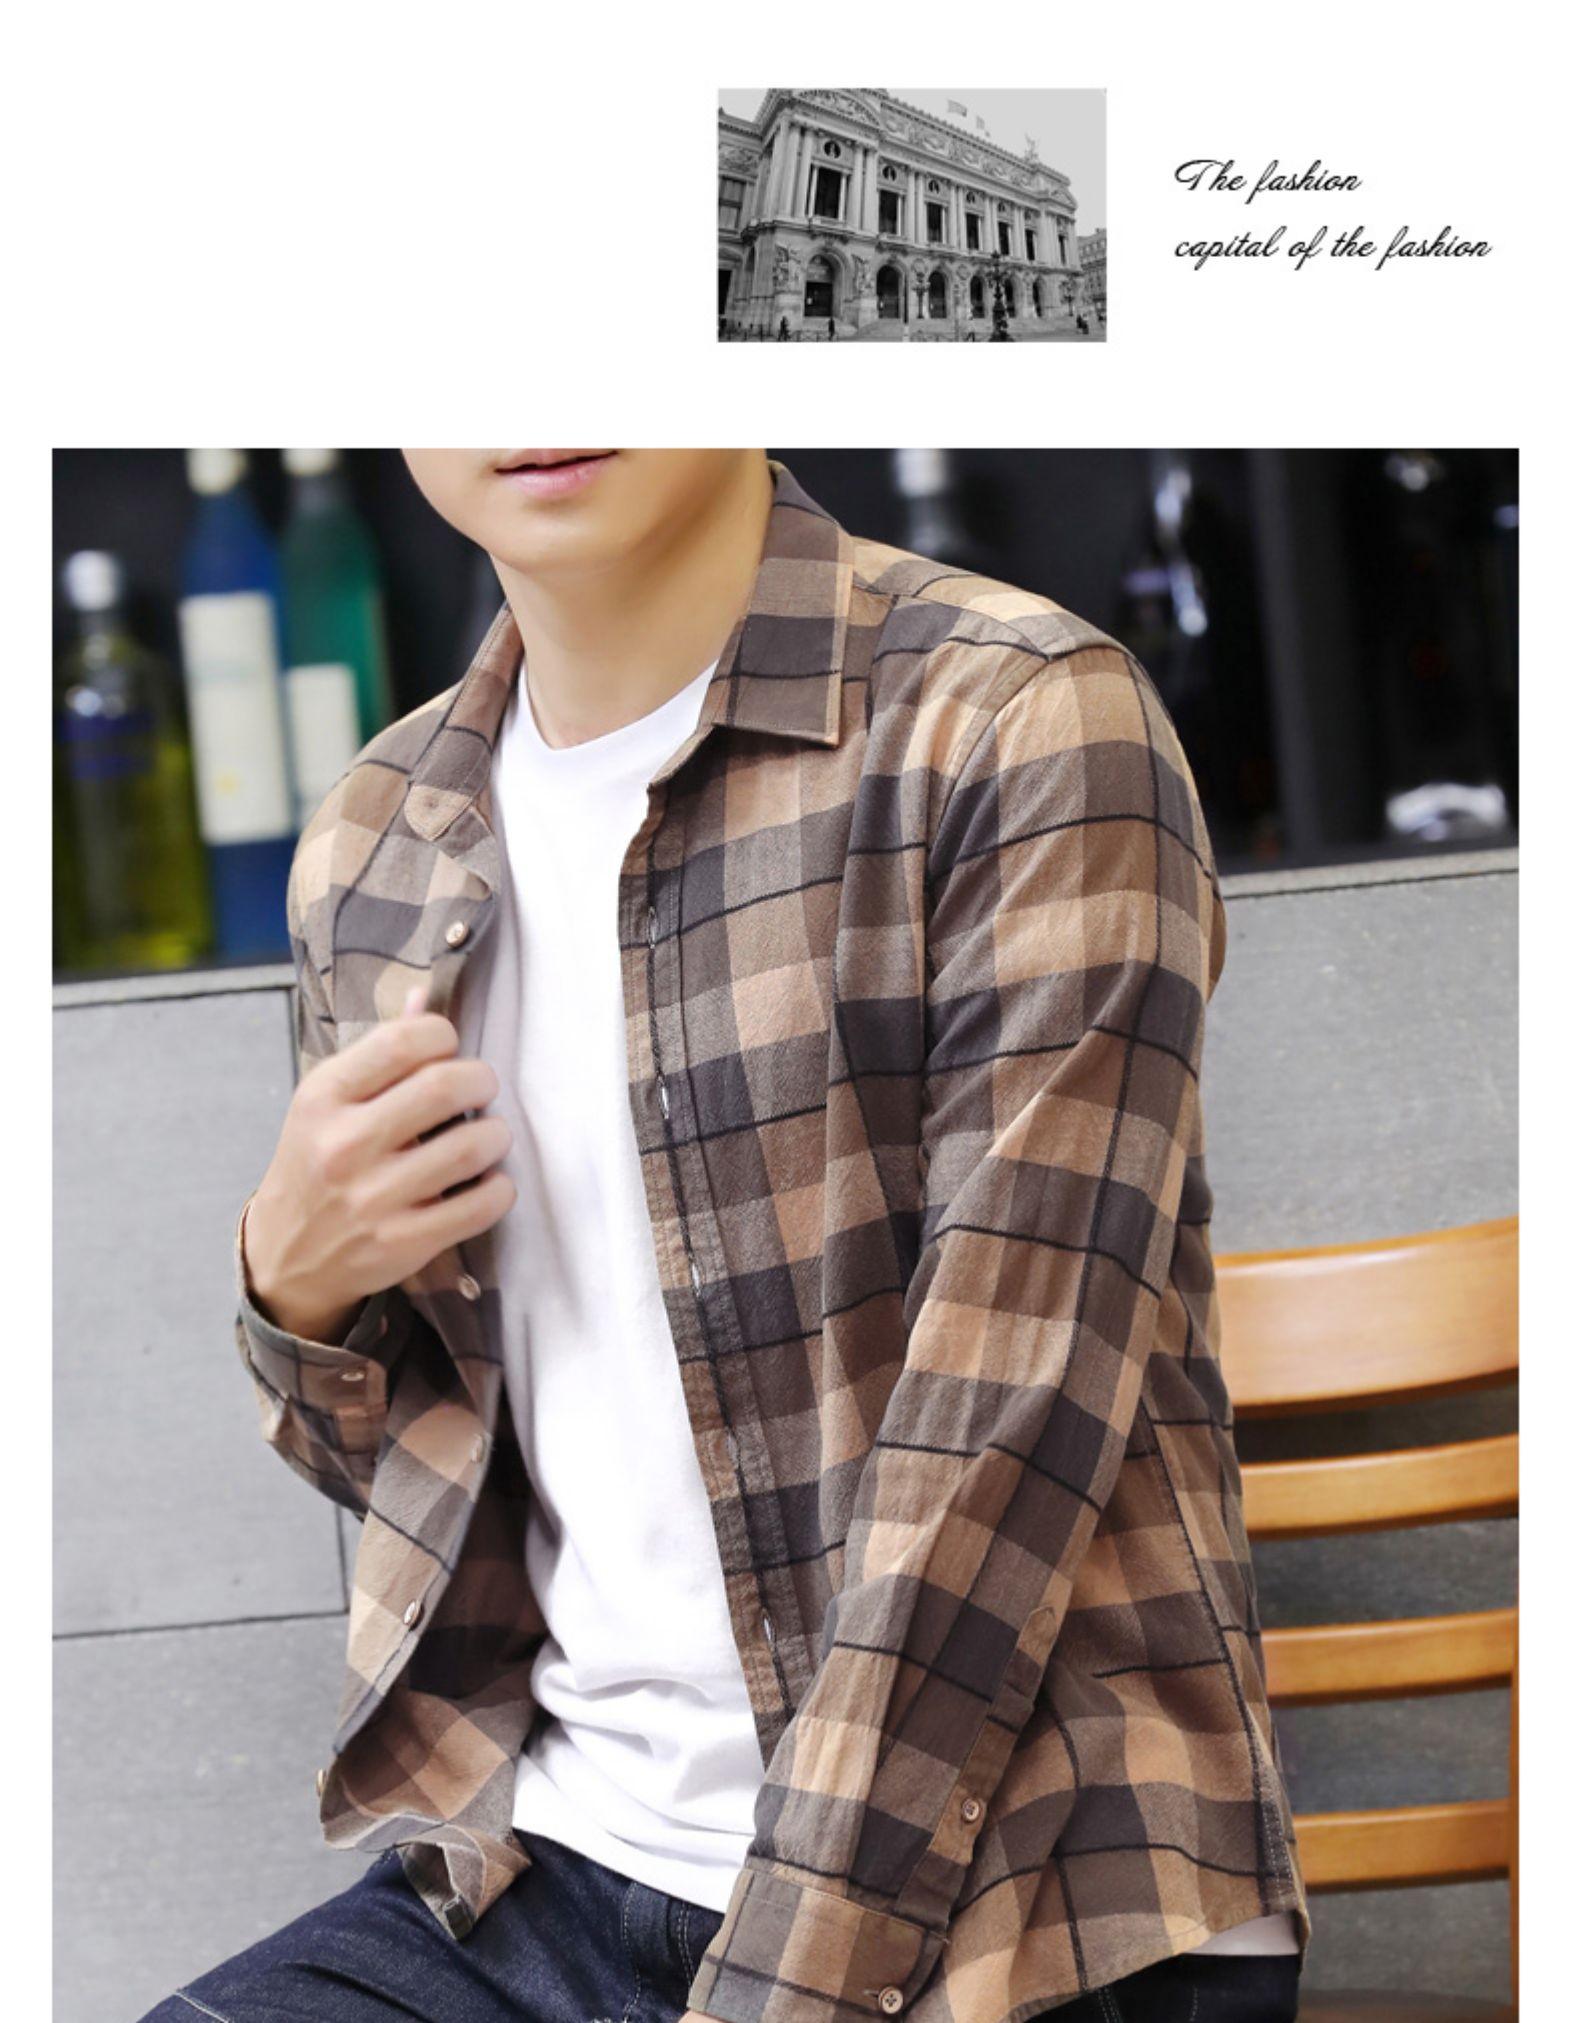 Autumn pure cotton lad shirt men's Korean version of the trend autumn fashion slim long-sleeved shirt men's handsome jacket 61 Online shopping Bangladesh